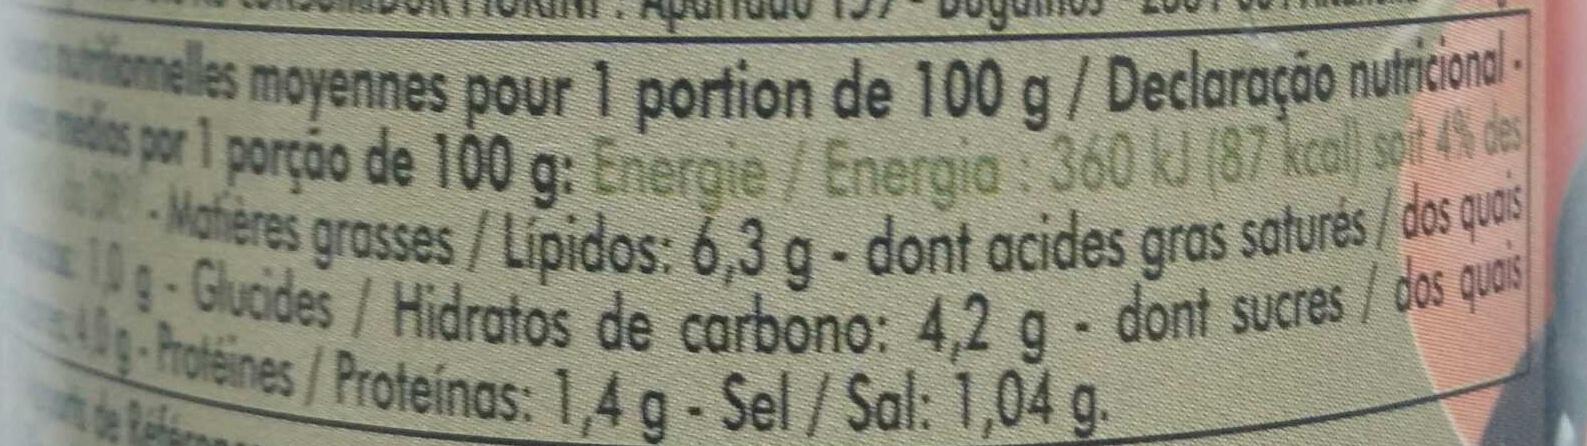 Tomate Olives - Informations nutritionnelles